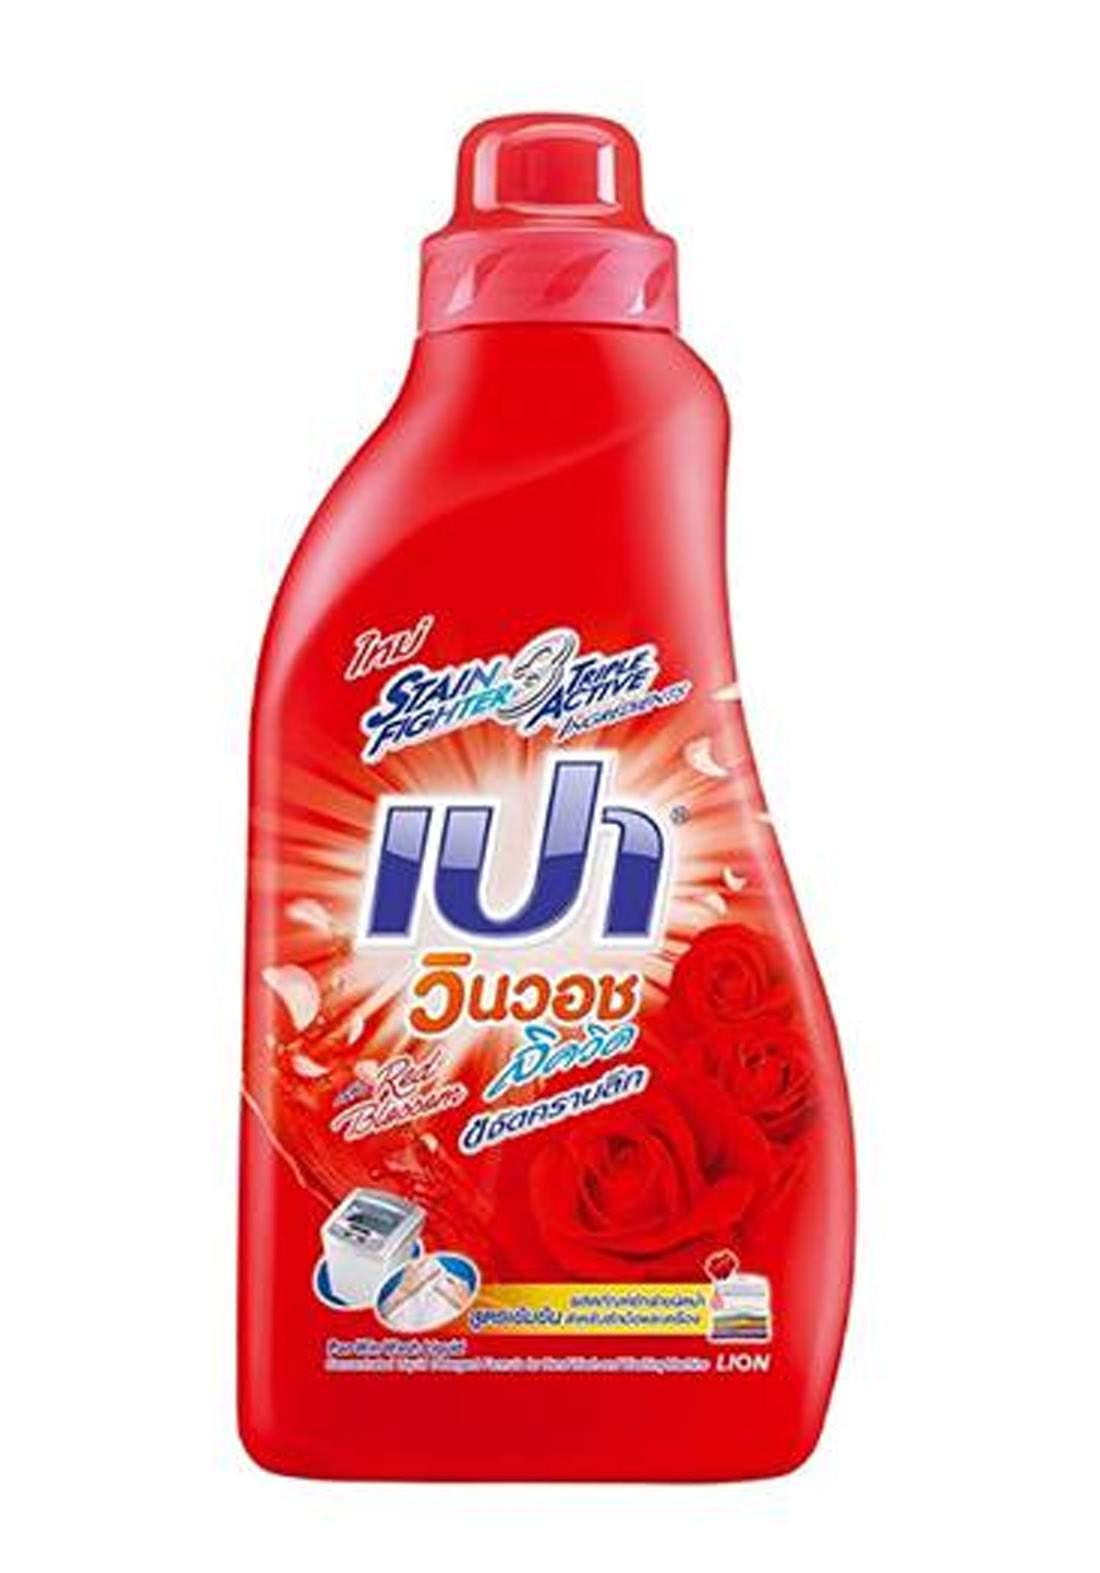 Iuh Pao Win Liquid Wash Stain Fighter 850 ml  سائل لغسل الملابس